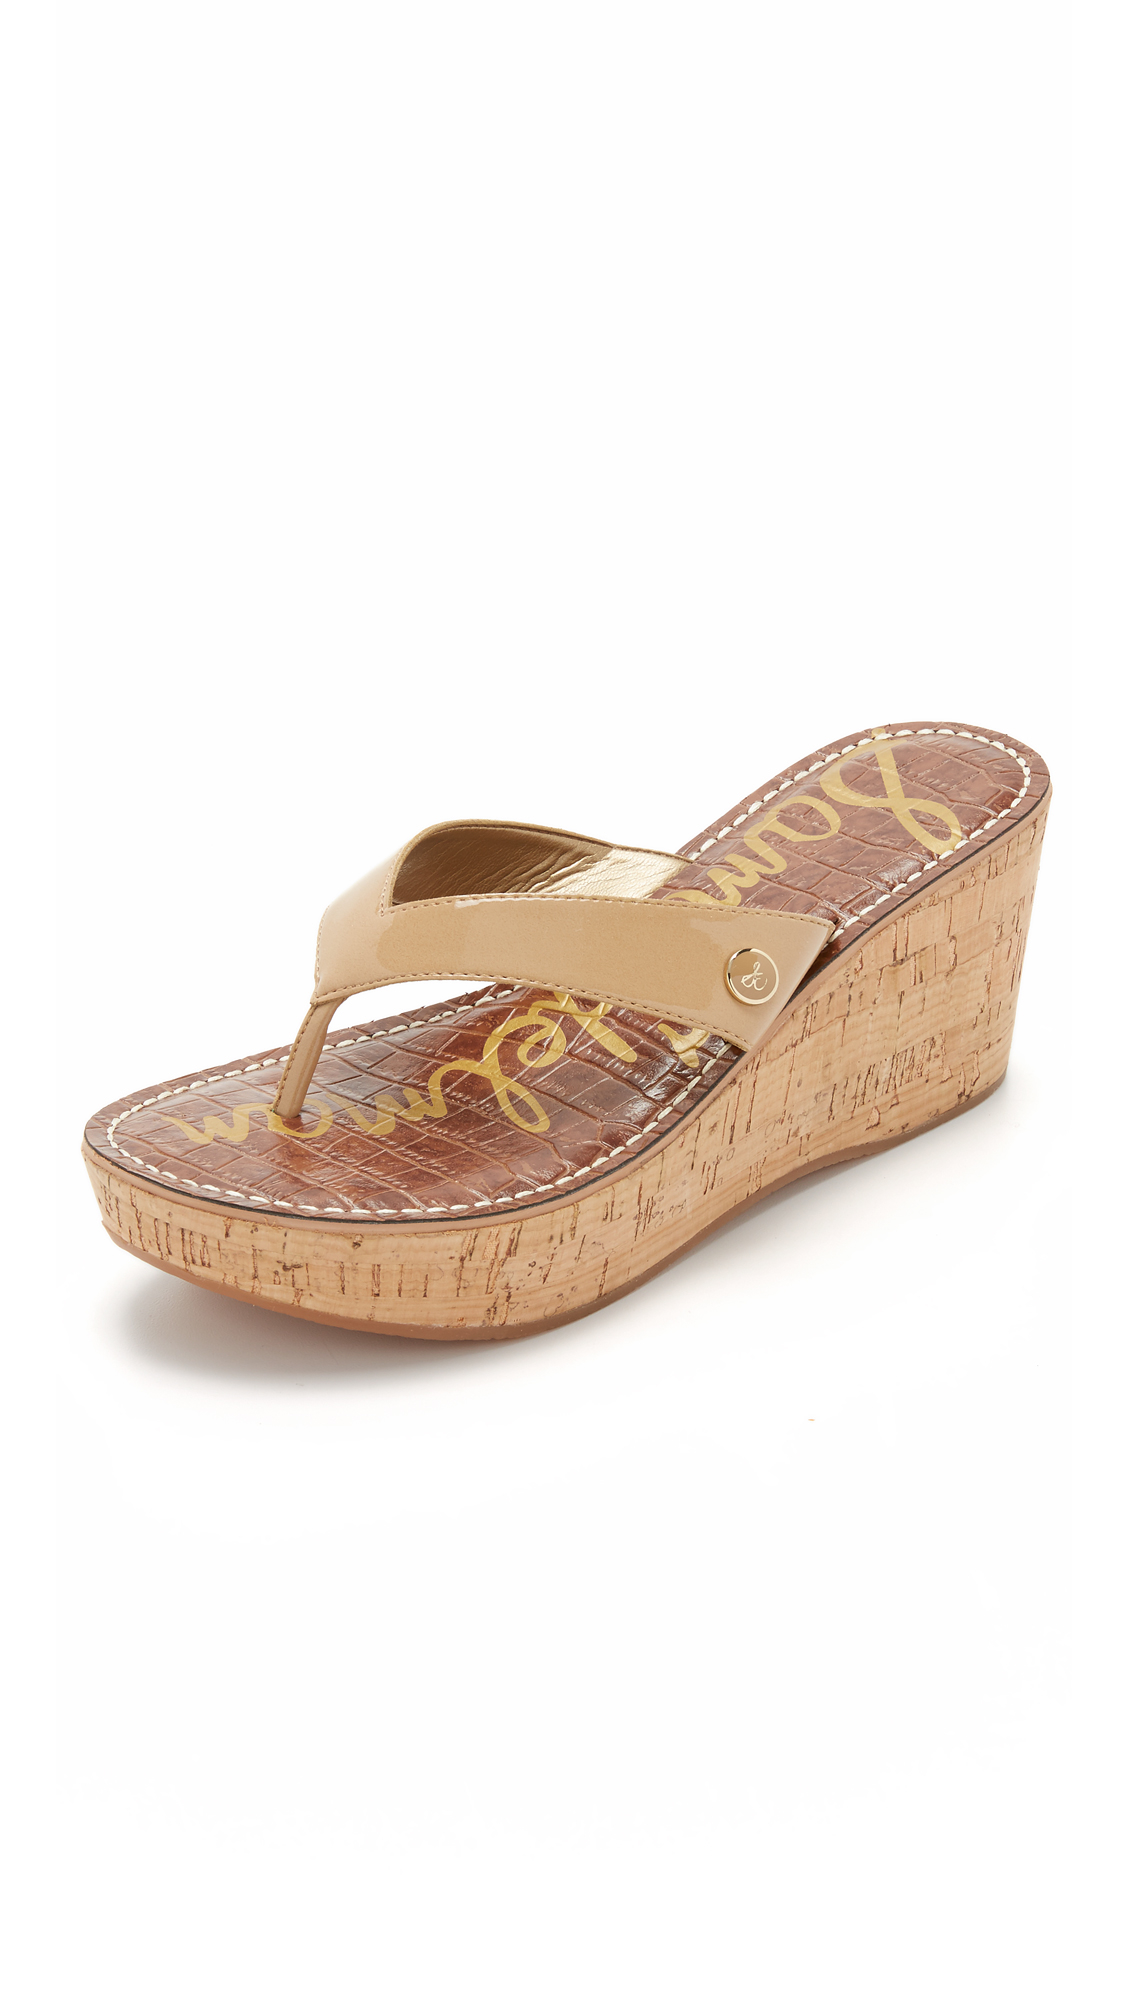 2f17421ada352 Sam Edelman Romy Wedge Thong Sandals in Brown - Lyst